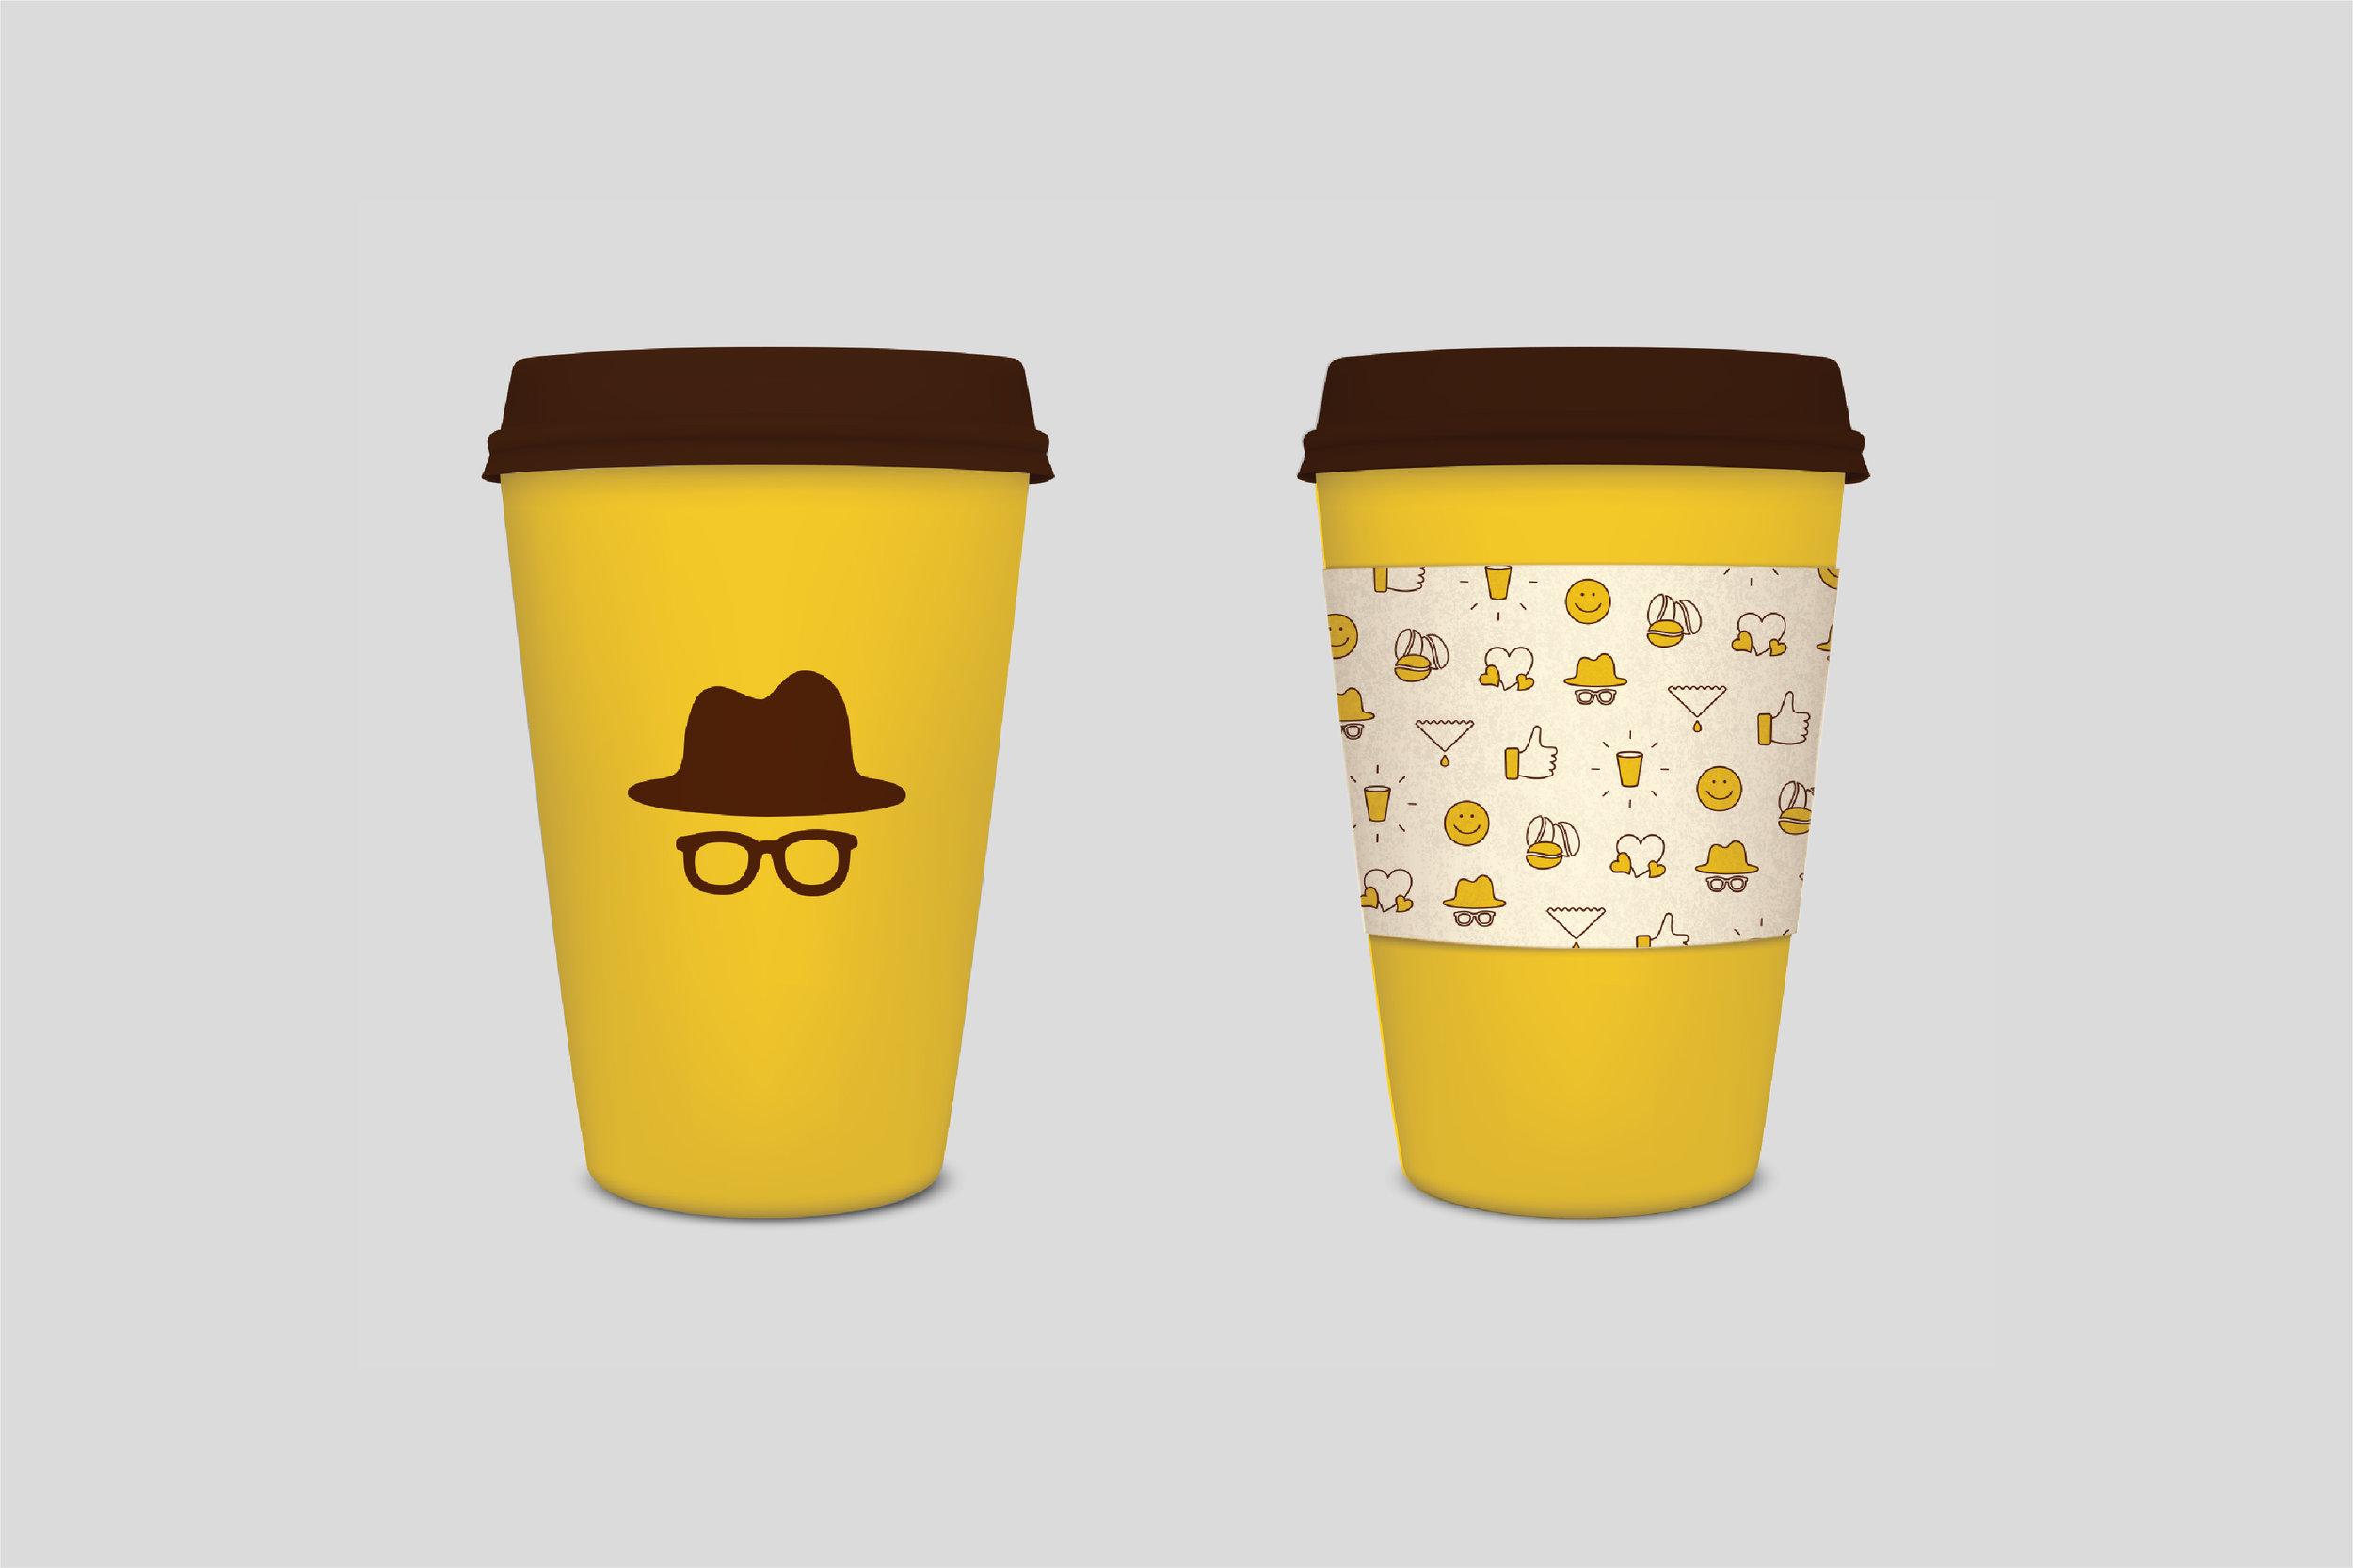 Case_Study_Cups.jpg